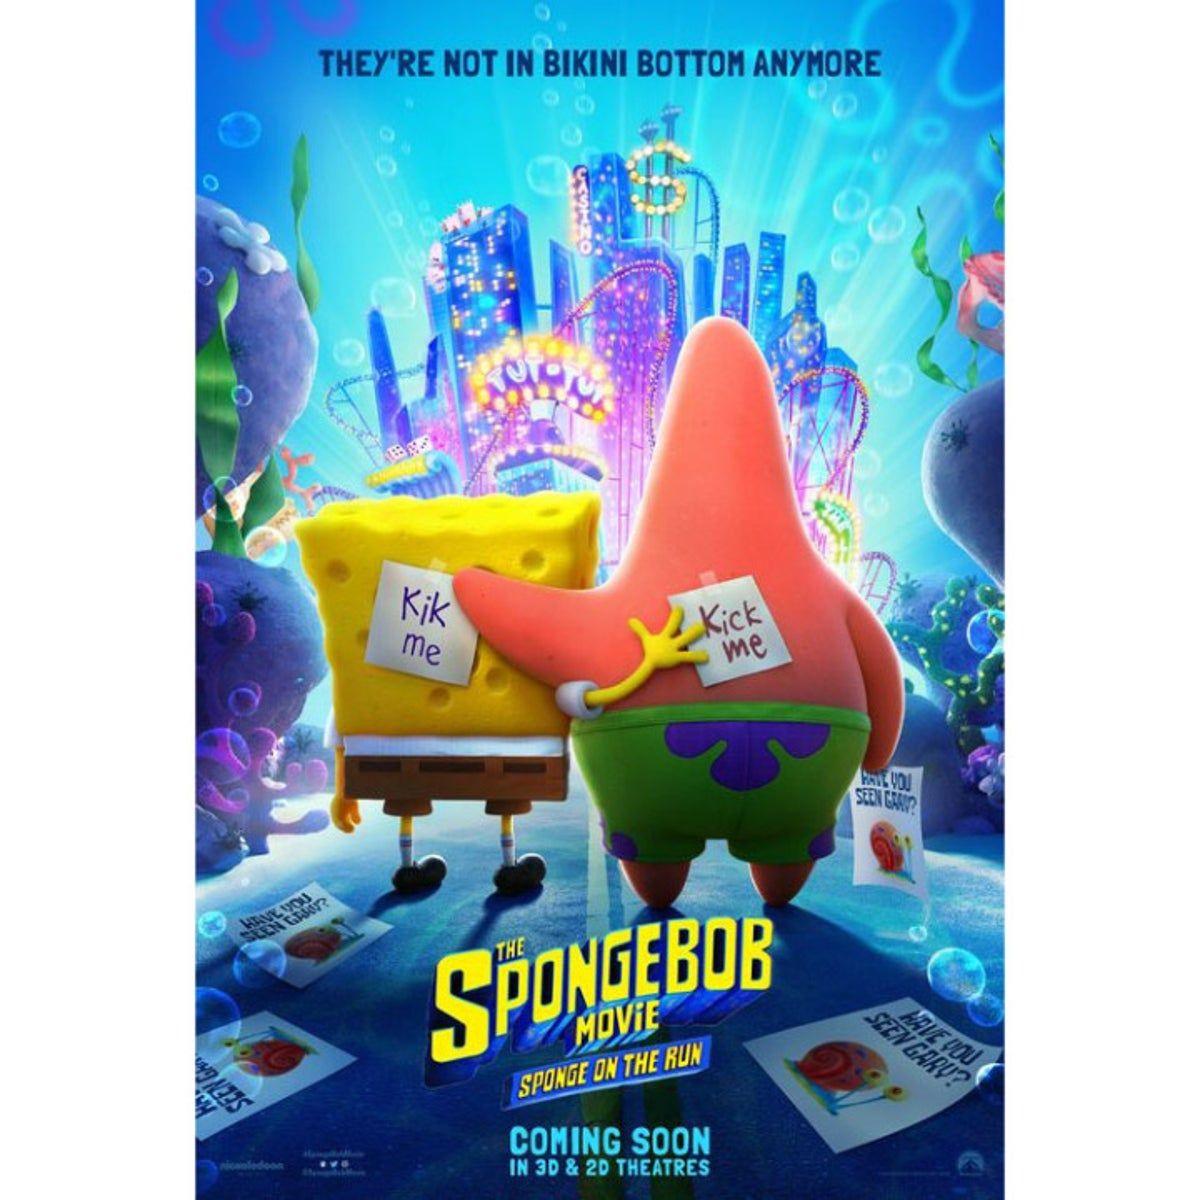 Poster Spongebob Movie Wonderful Life On Mercari Spongebob Free Movies Online Full Movies Online Free